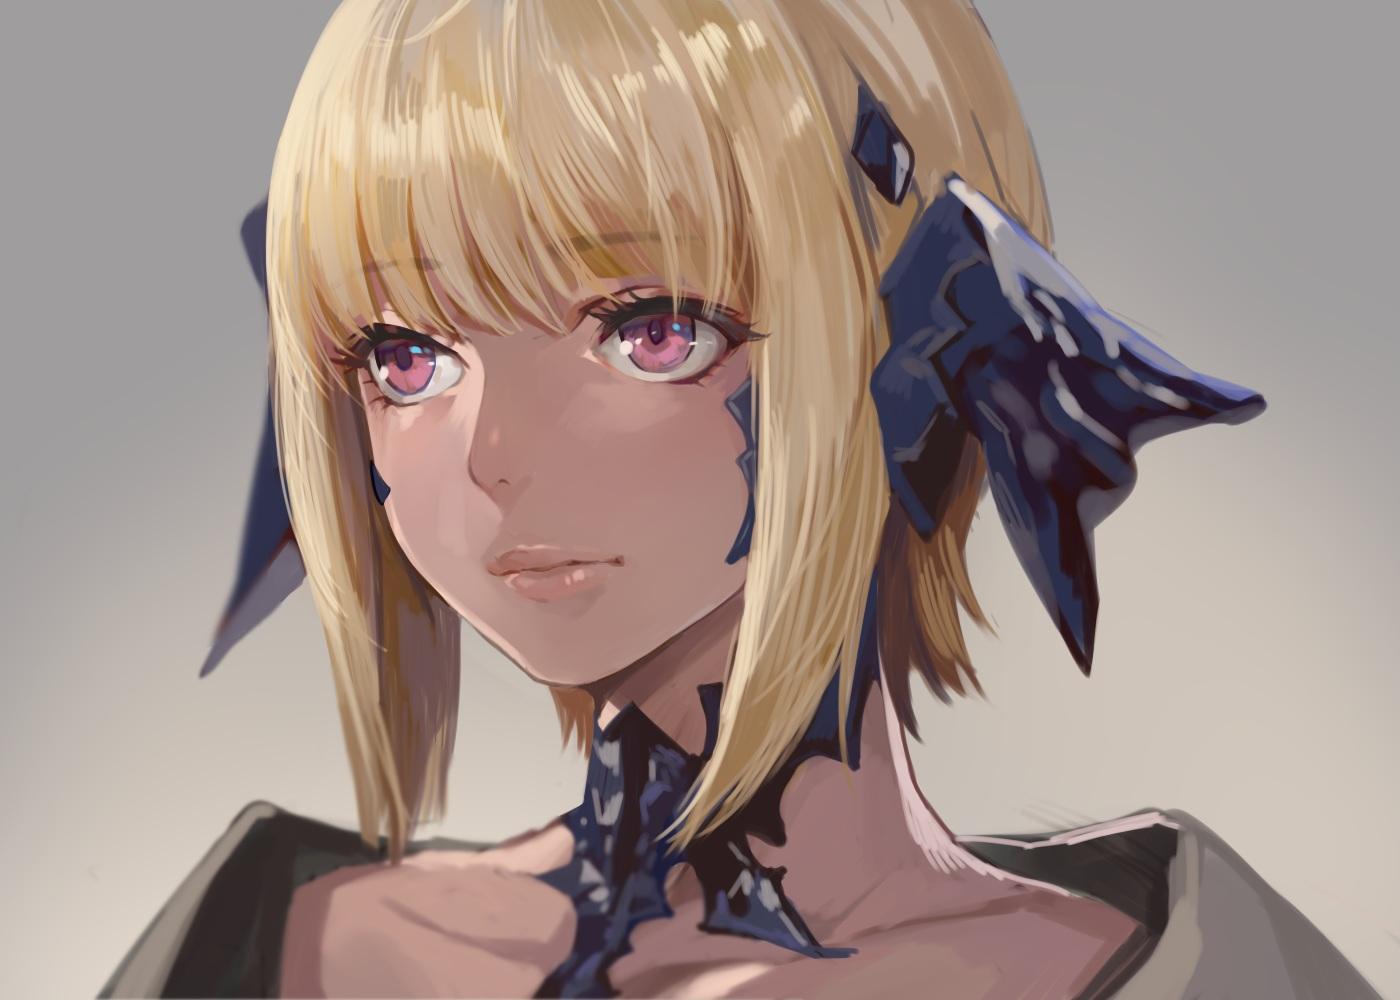 au_ra blonde_hair close final_fantasy final_fantasy_xiv gradient gray momoko_(momopoco) pink_eyes short_hair